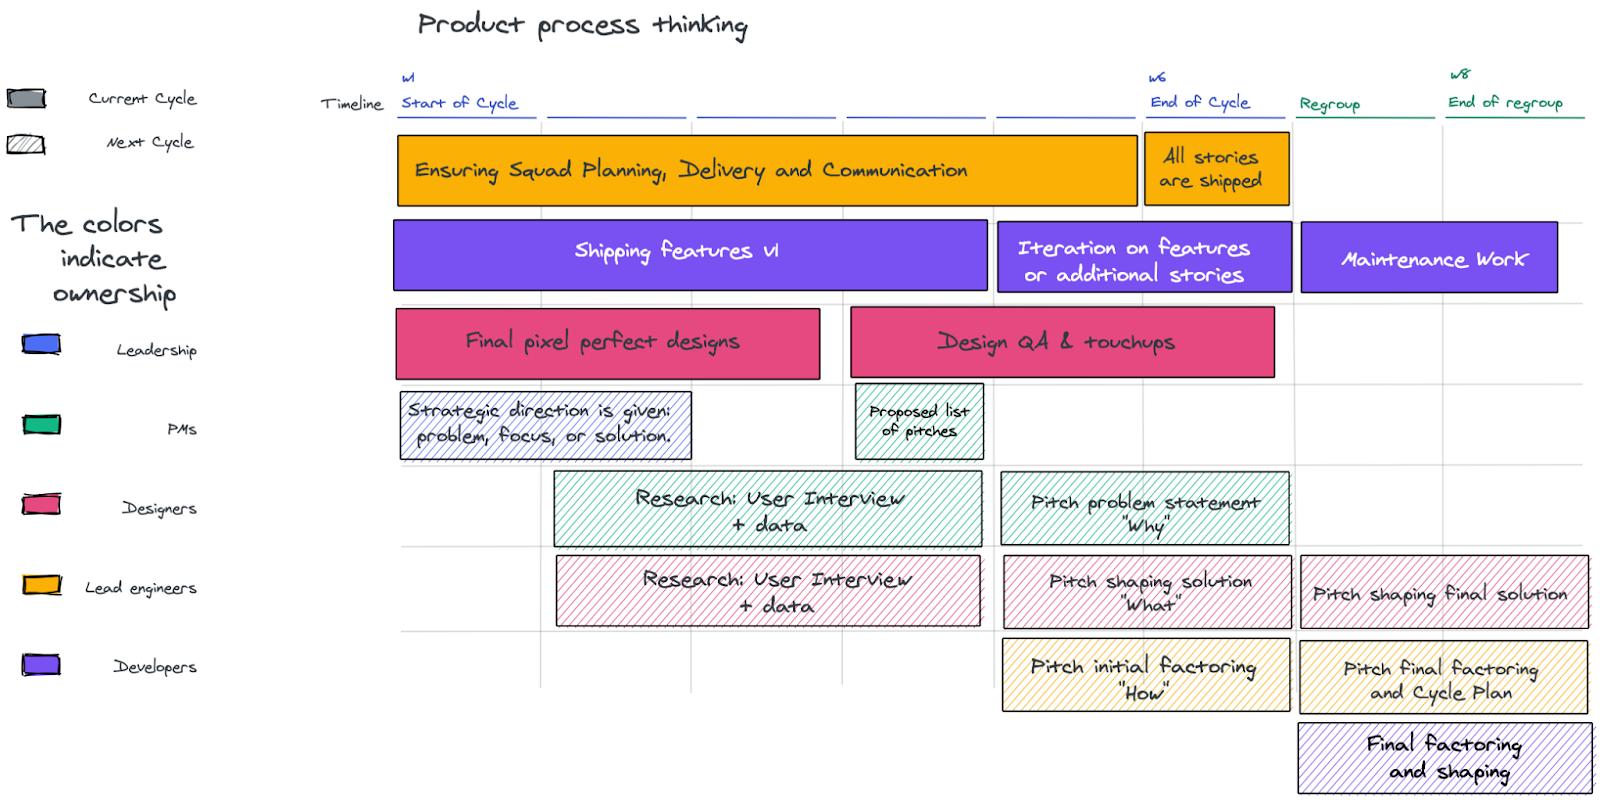 Shape up methodology for project management illustrated in Slite